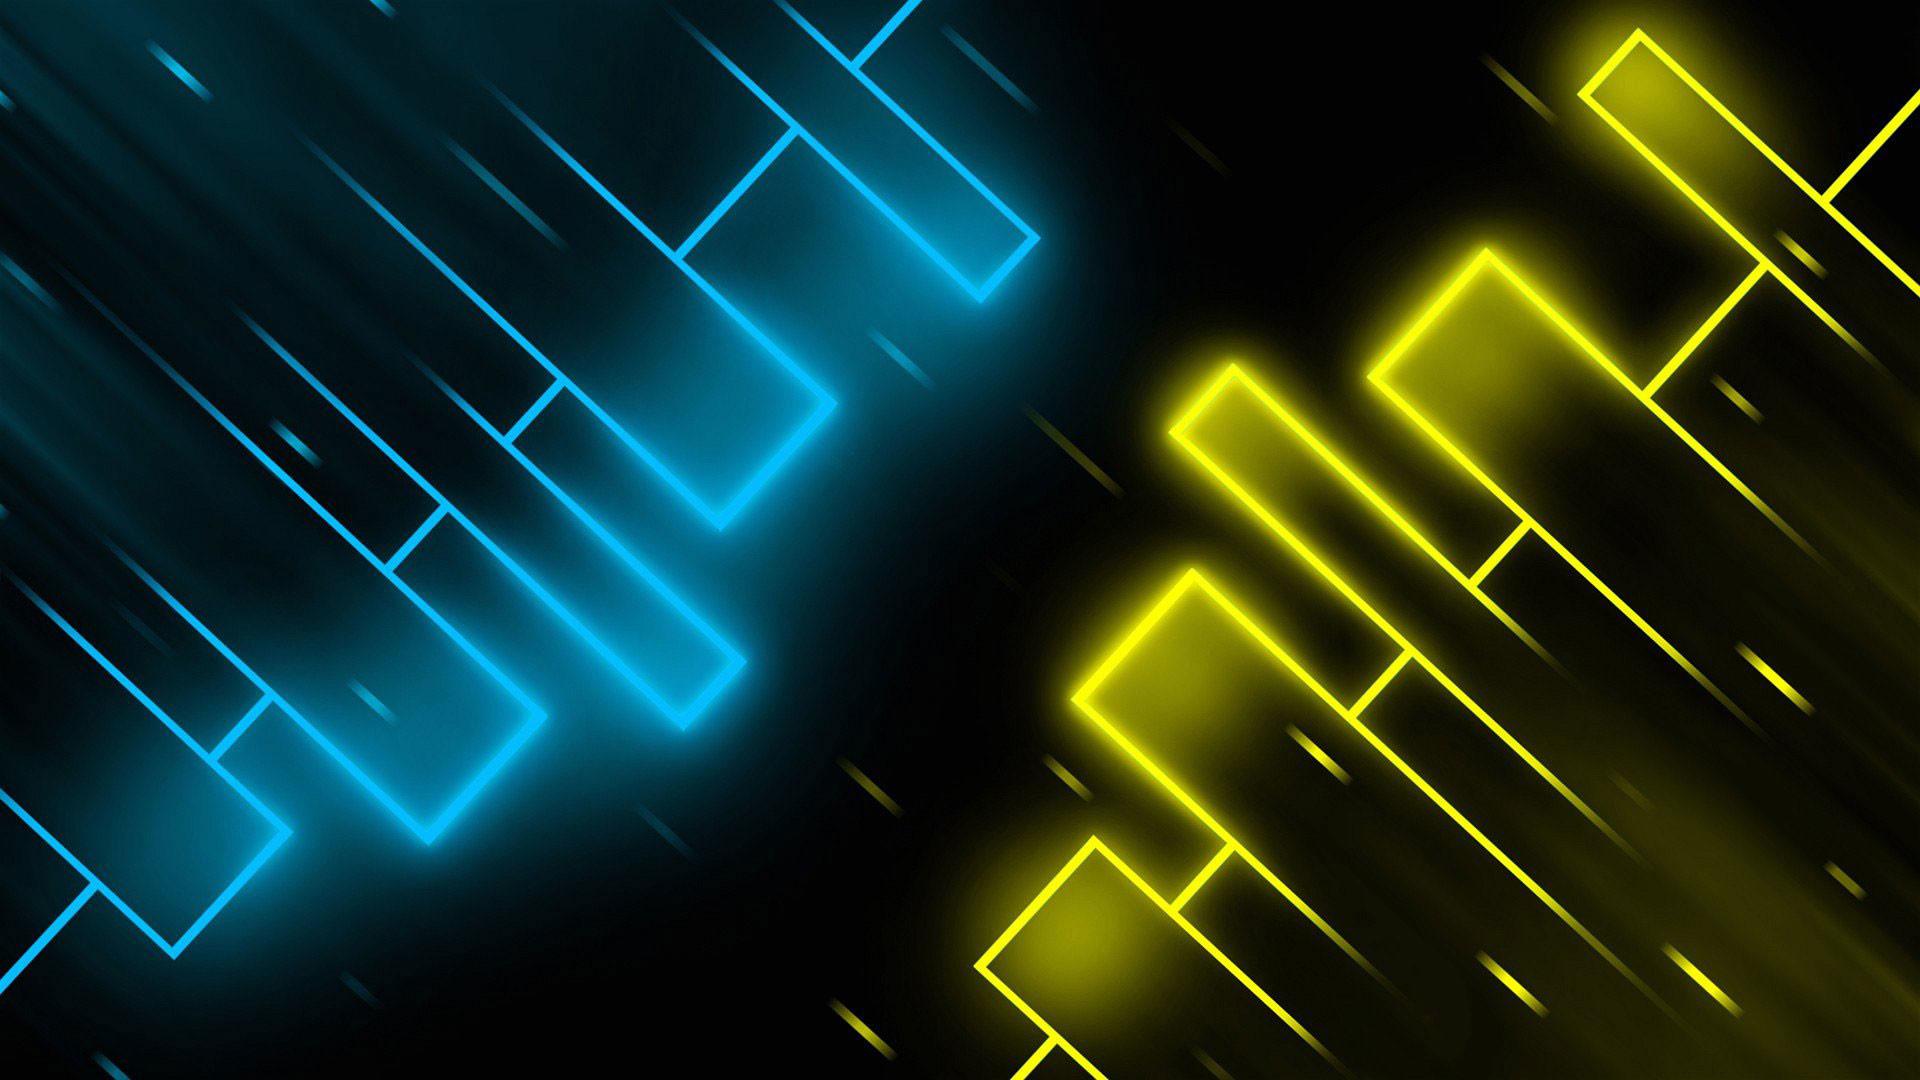 hd pics photos neon blue yellow neon wallpapers desktop background wallpaper